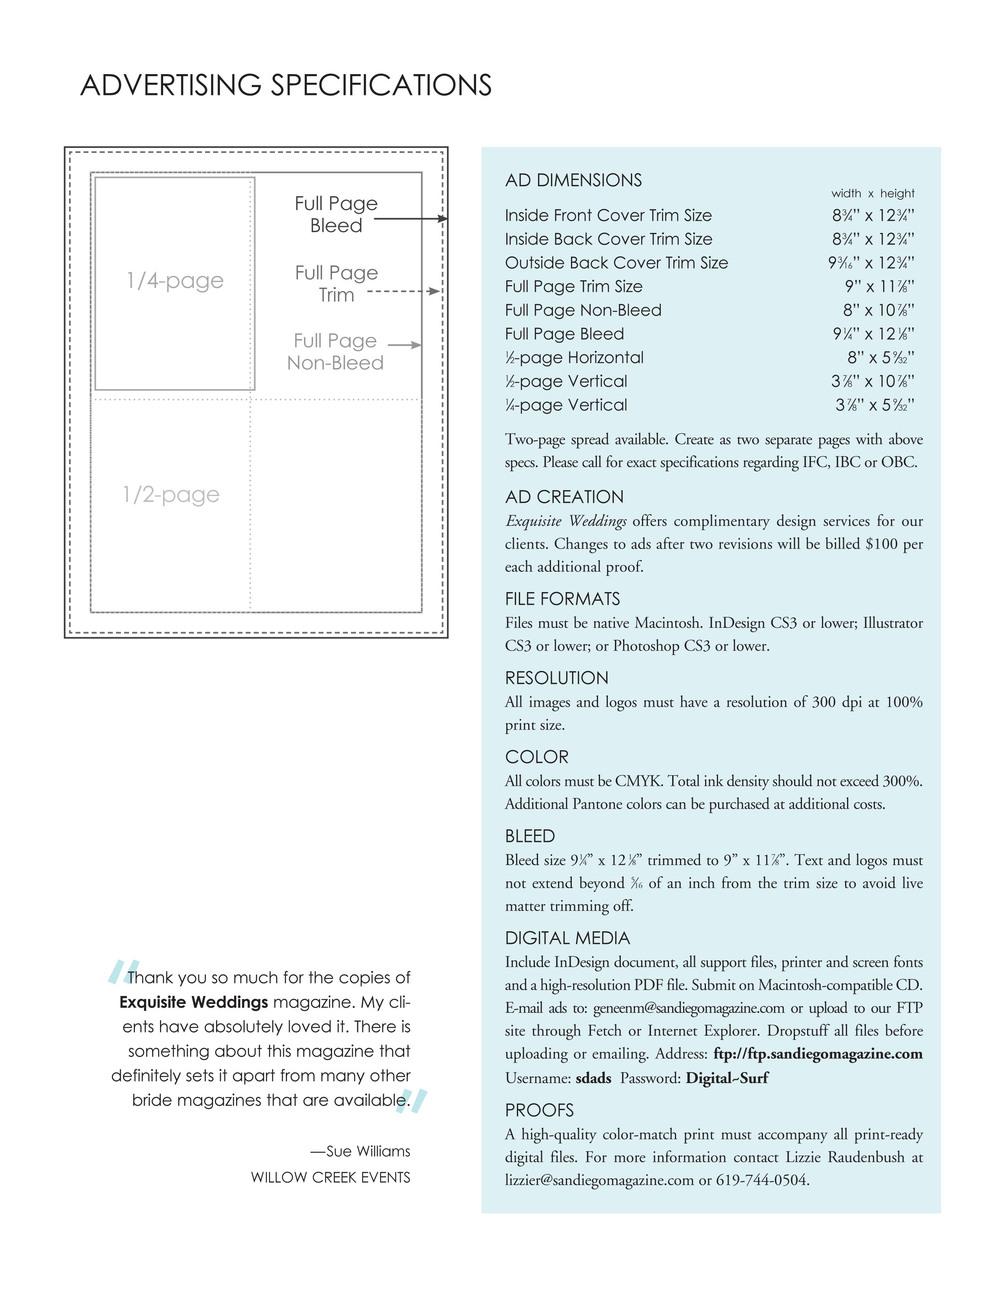 EW Media Kit_Print-6.jpg